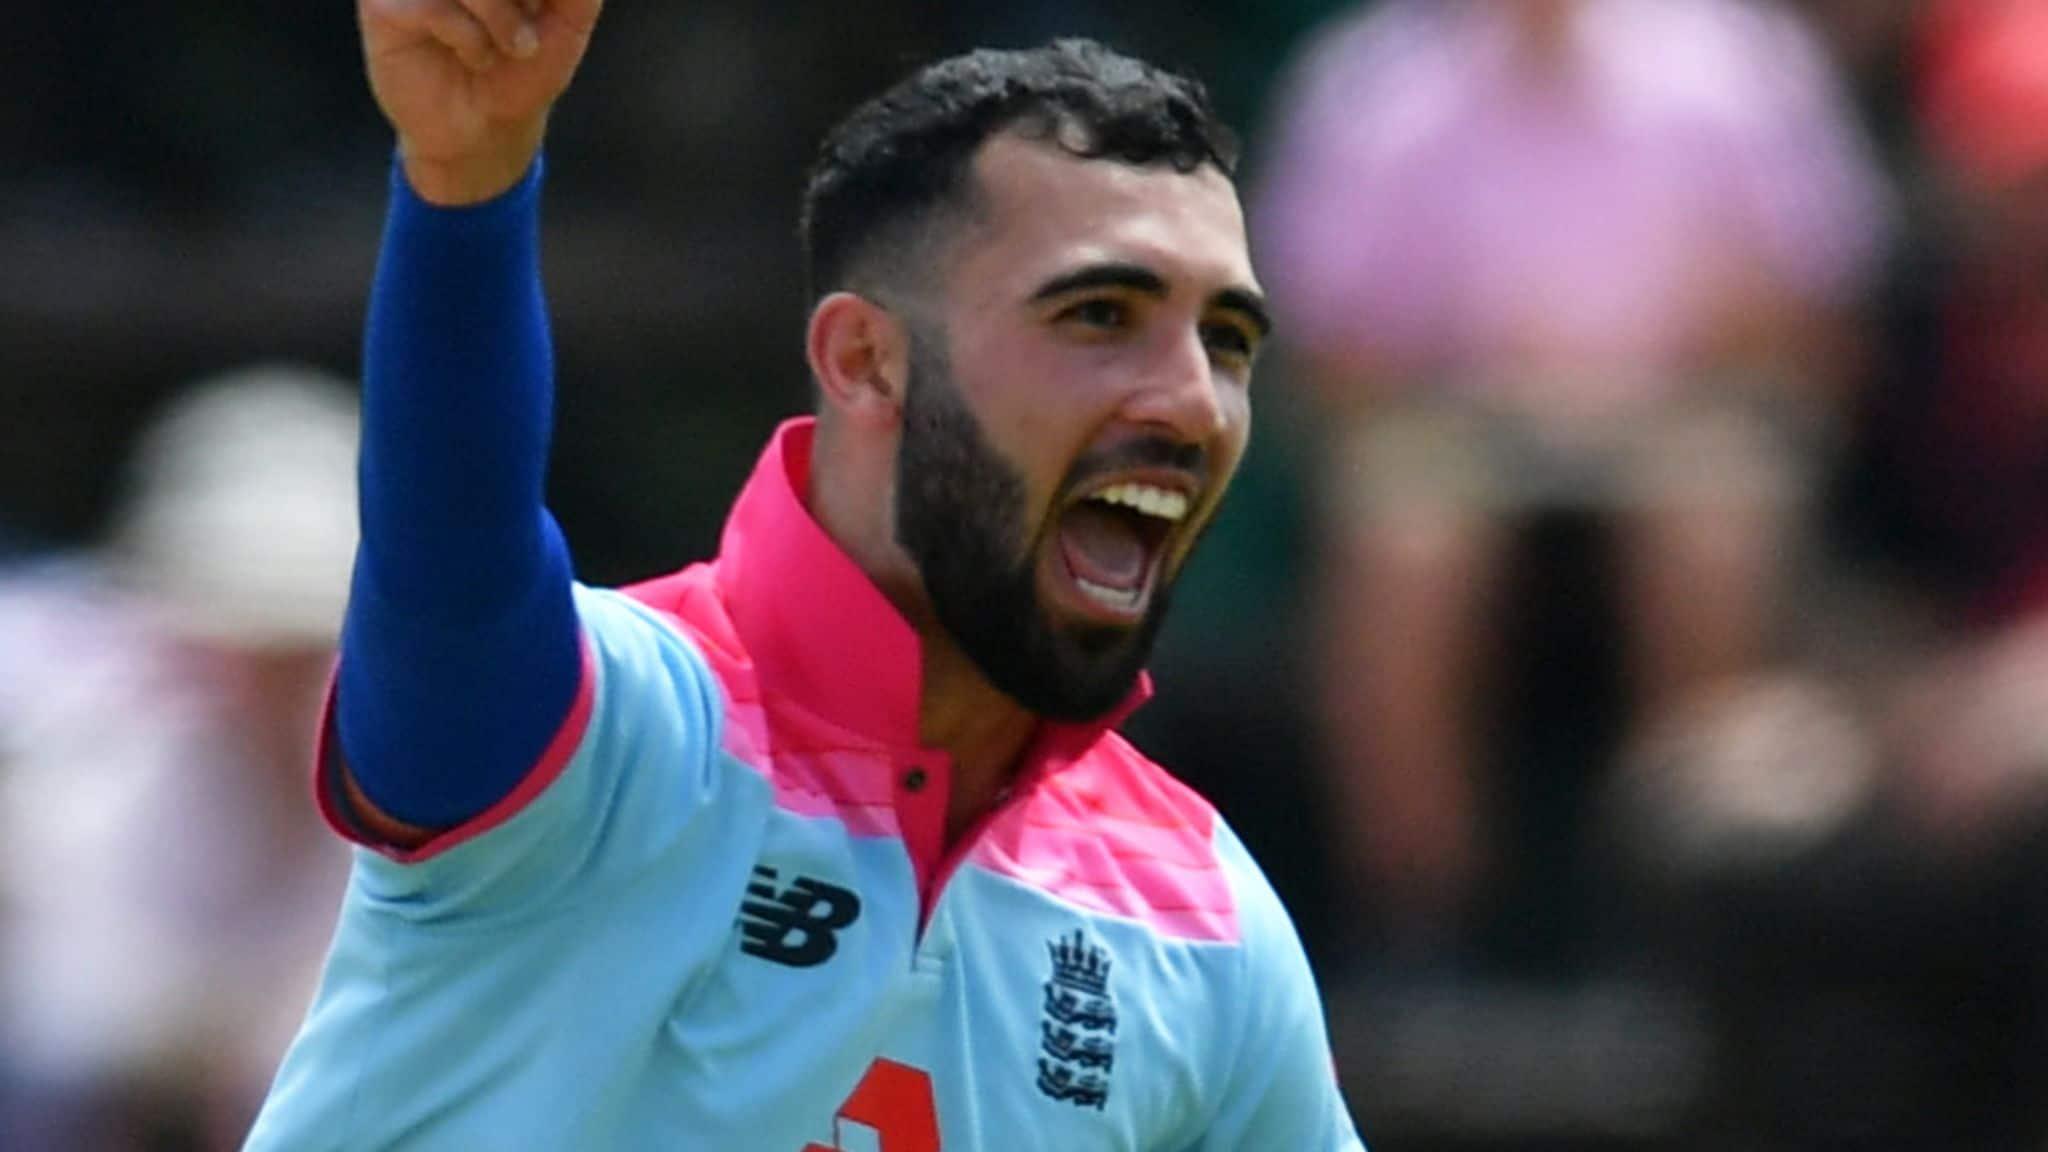 Saqib Mahmood British Cricketer